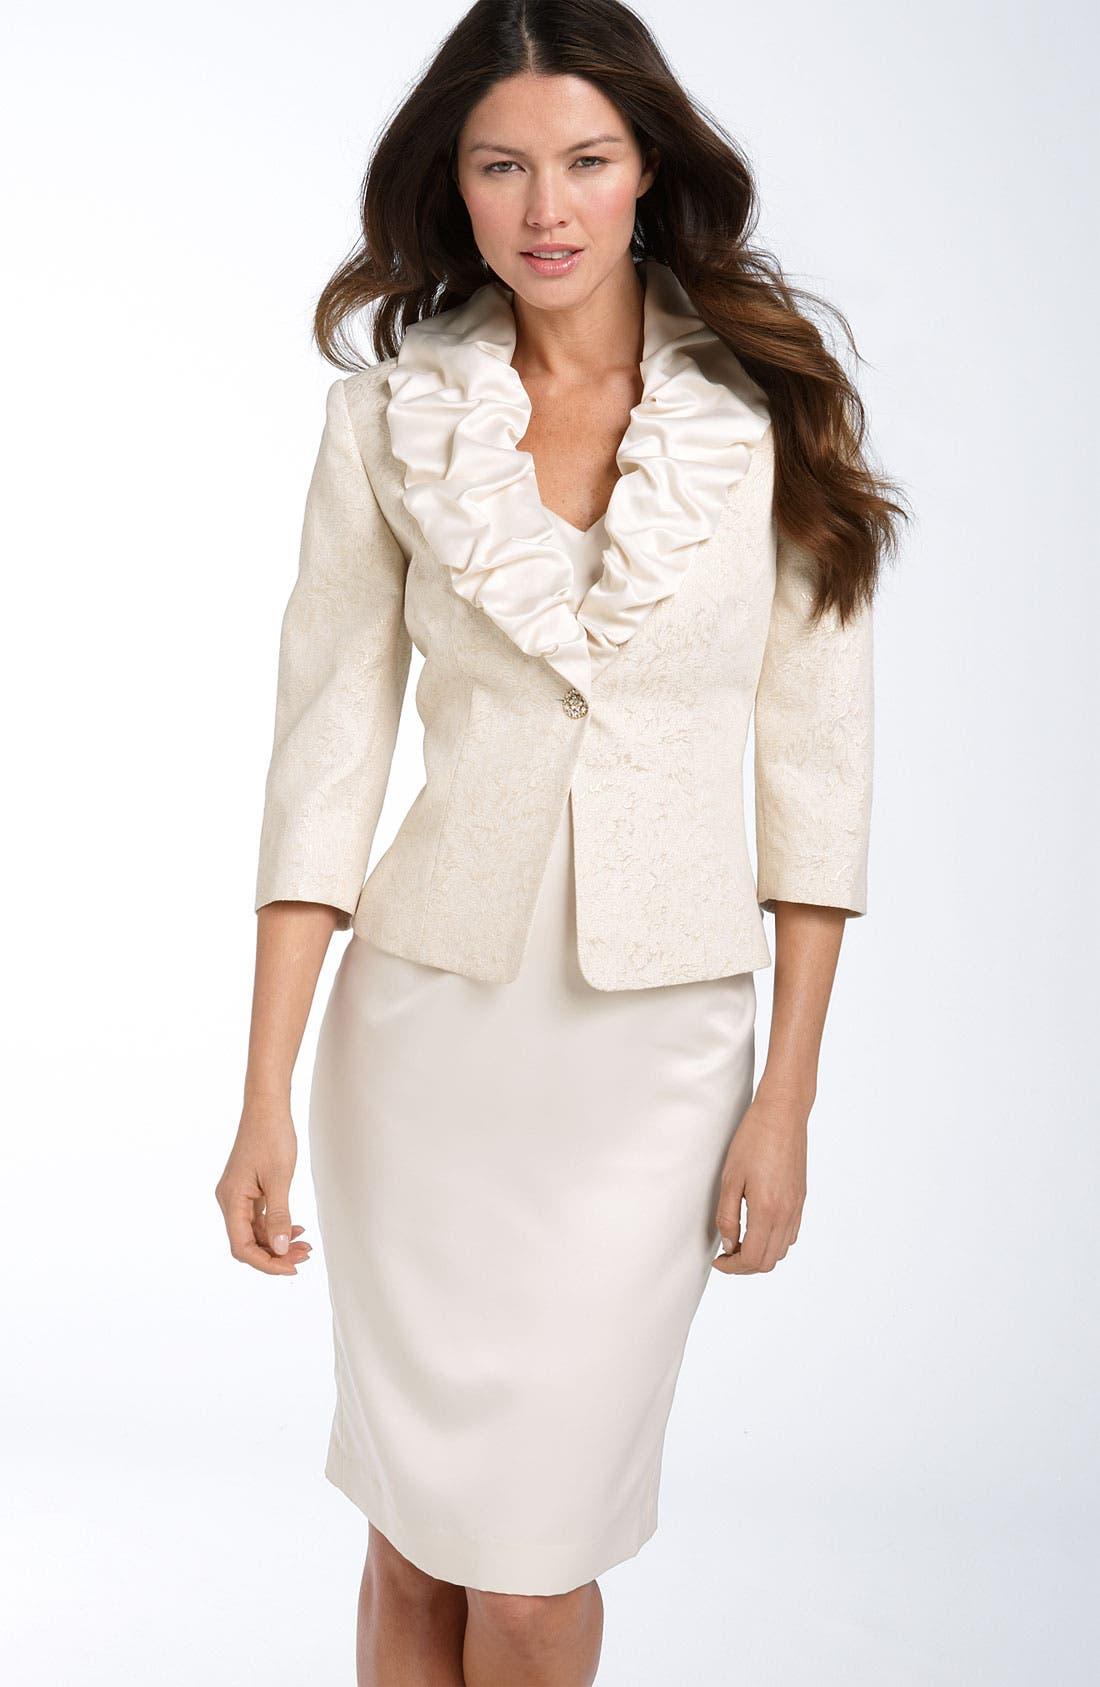 Alternate Image 1 Selected - Adrianna Papell Sheath Dress with Jacquard Jacket